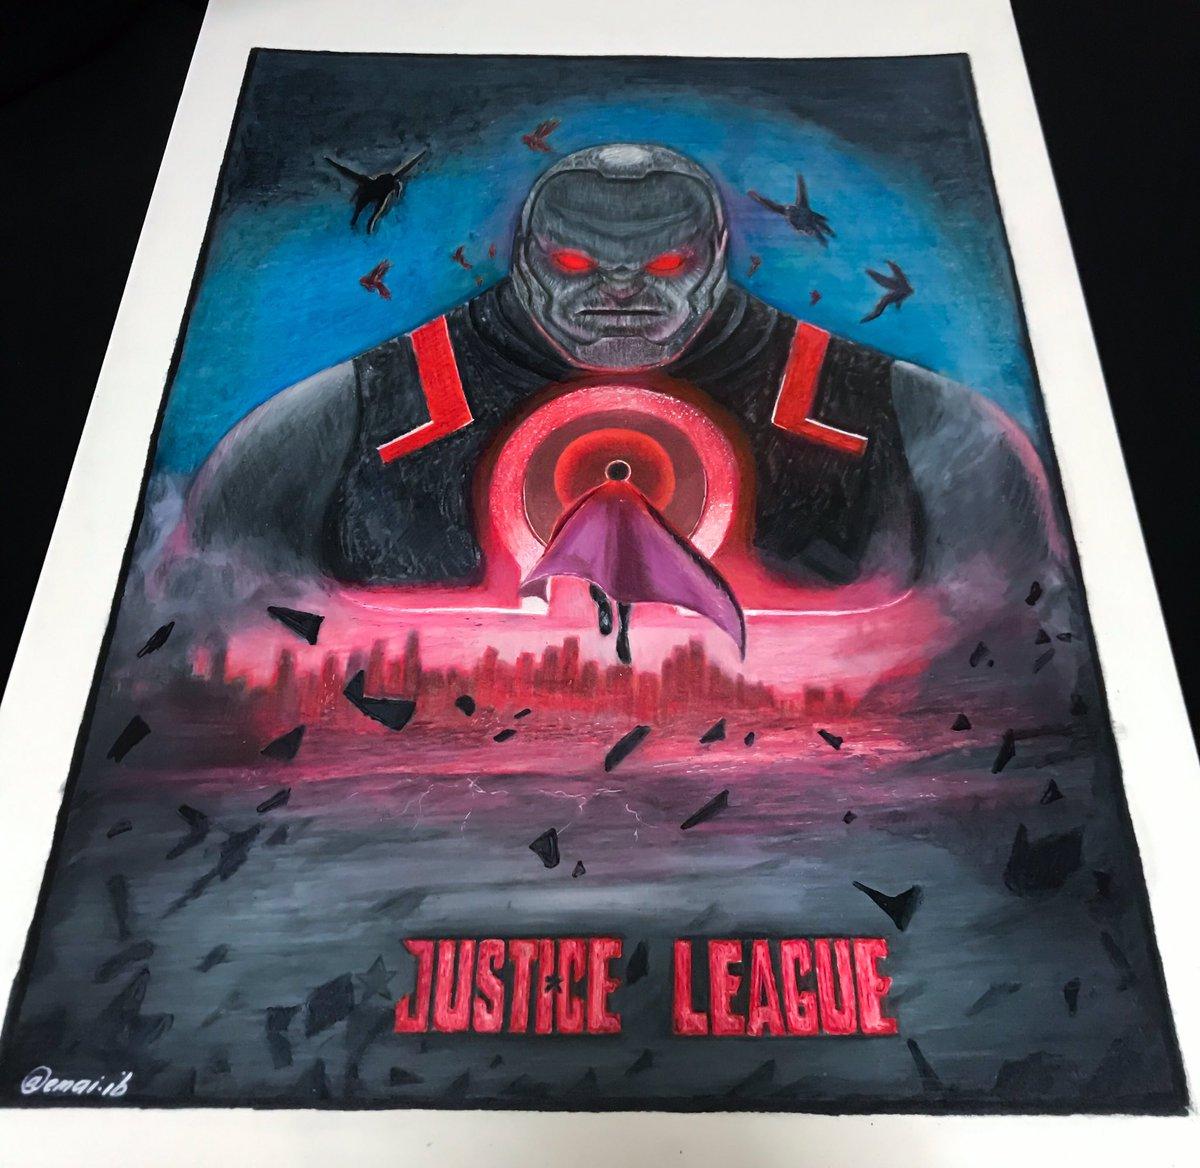 Darkseid justice league done ✍🏻💯  #justiceleague #darkseid #drawing #vsco #vscom #vscocam #drawings #drawingsketch #prismacolor #touchfivemarkers #malaysia #polychromospencils #fabercastell #polychromos @twt_seni @FineArtMalaysia @twt_grafik